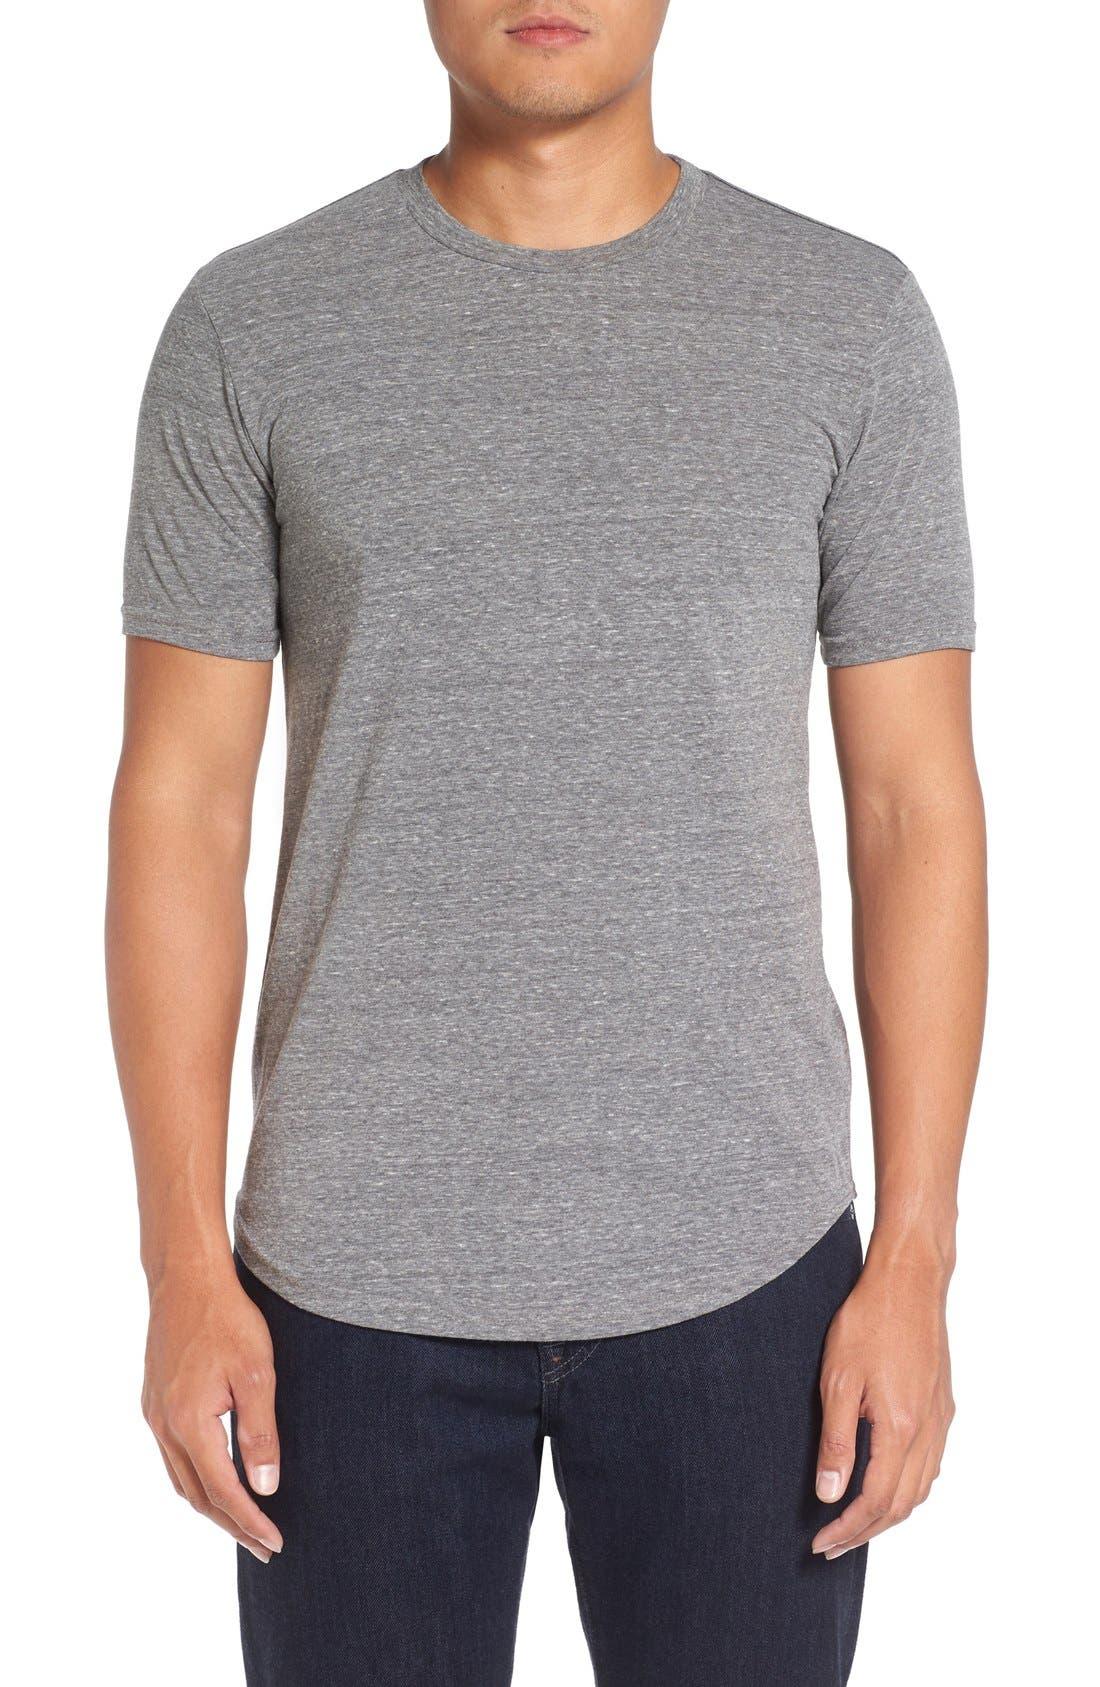 Goodlife Curved Hem Crewneck T-Shirt